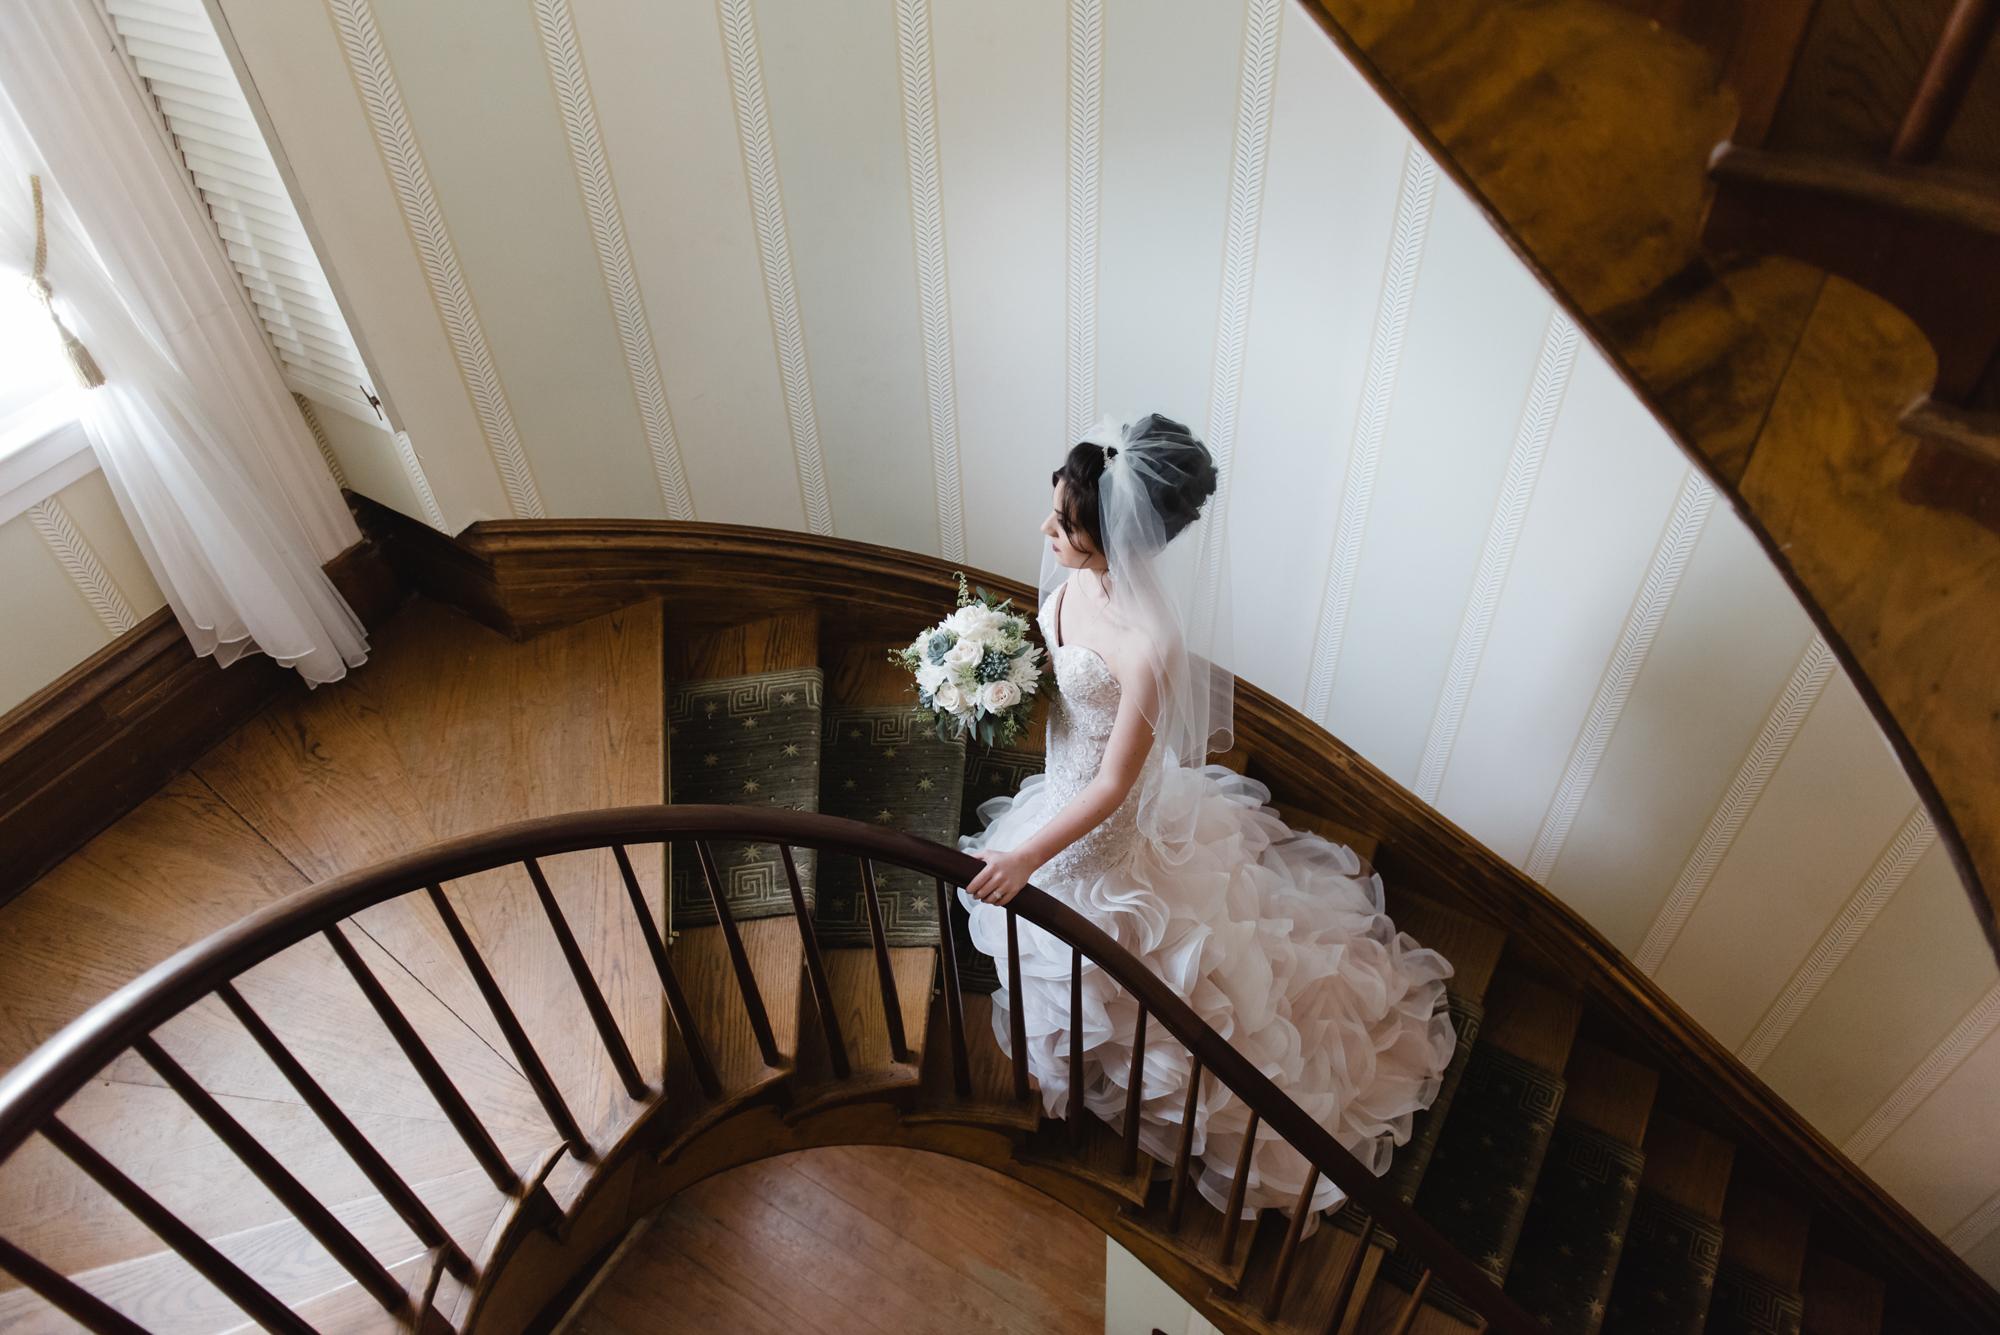 baton-rouge-wedding-photographer-3931.jpg